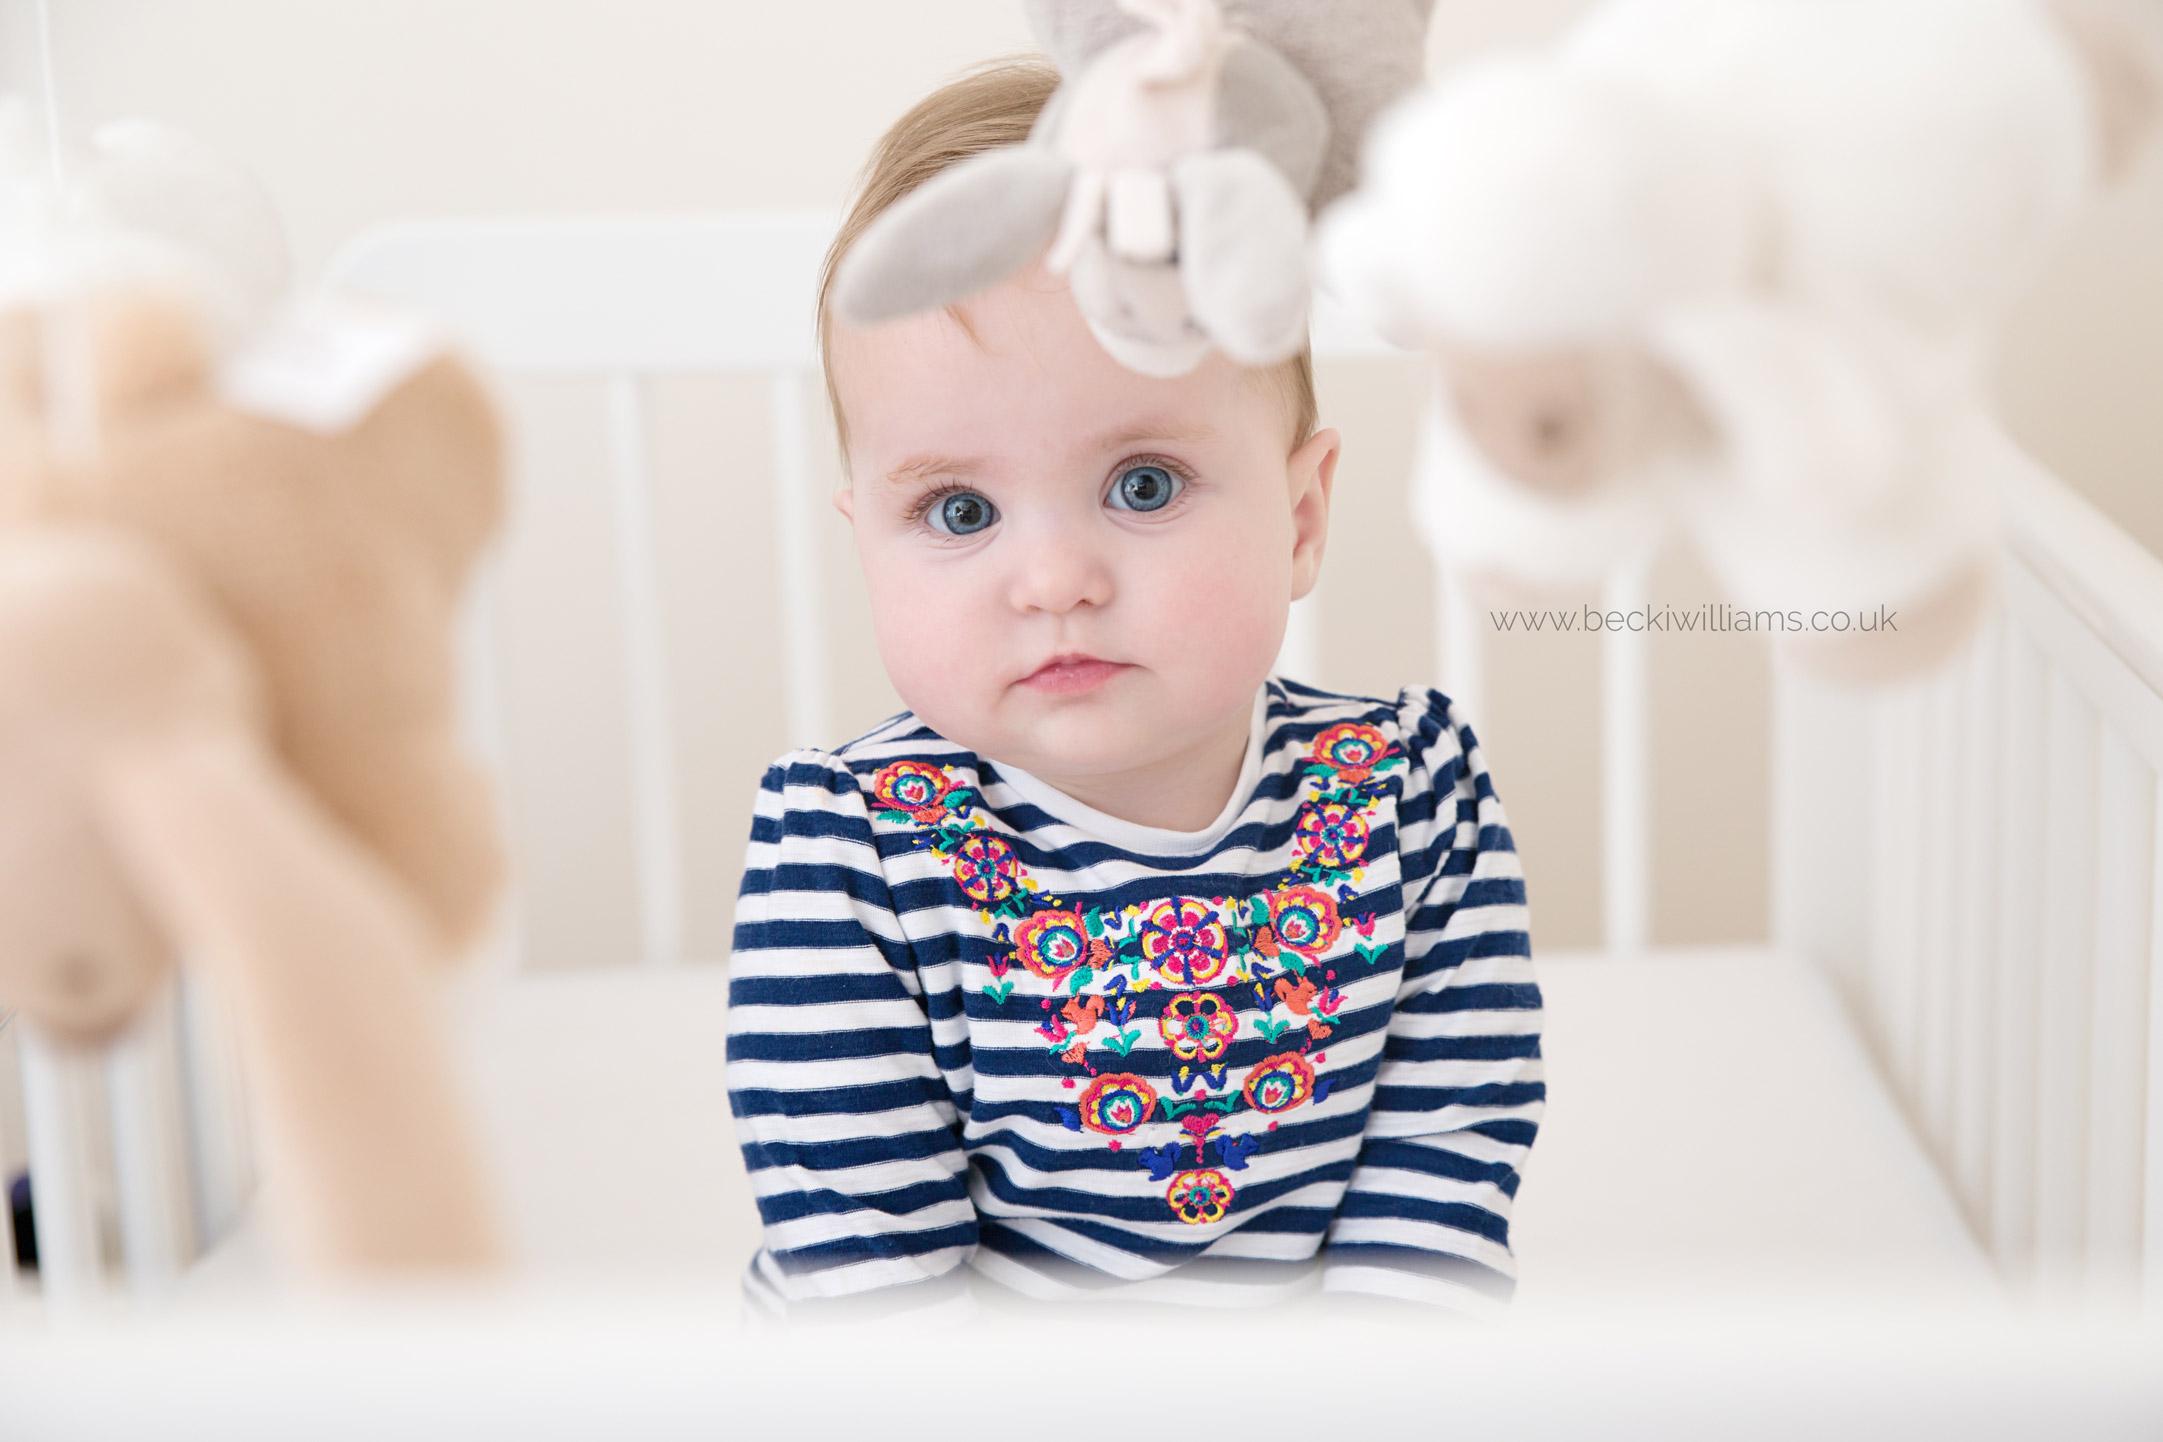 Baby-photography-hemel-hempstead-baby-in-cot-through-mobile